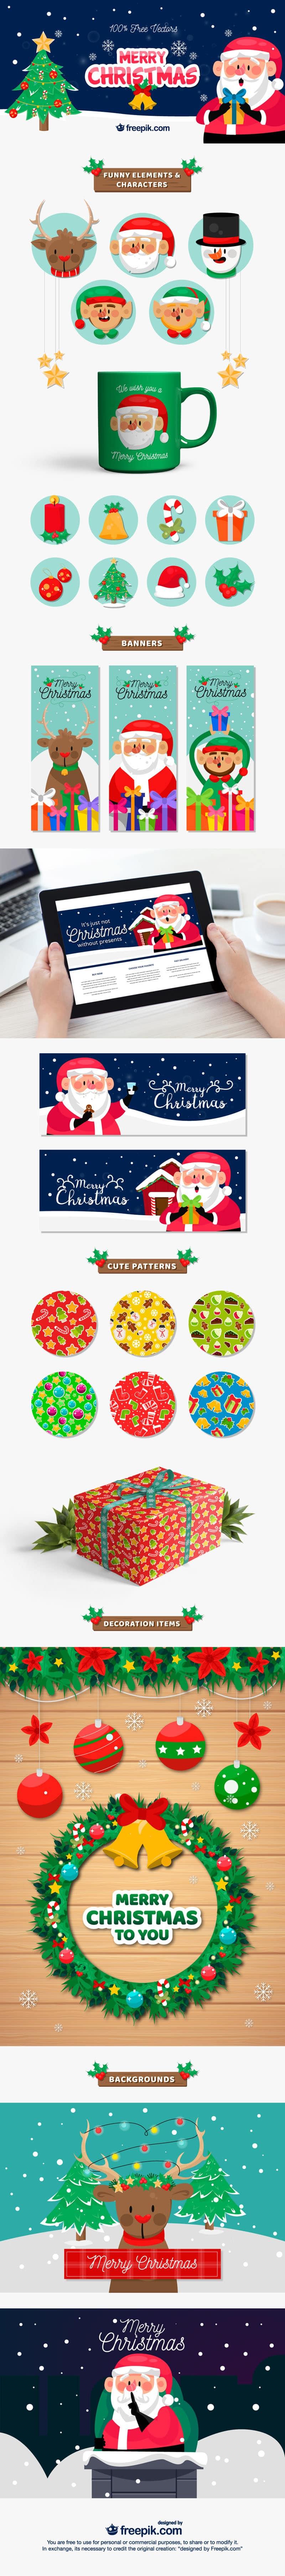 free Christmas Graphics & patterns